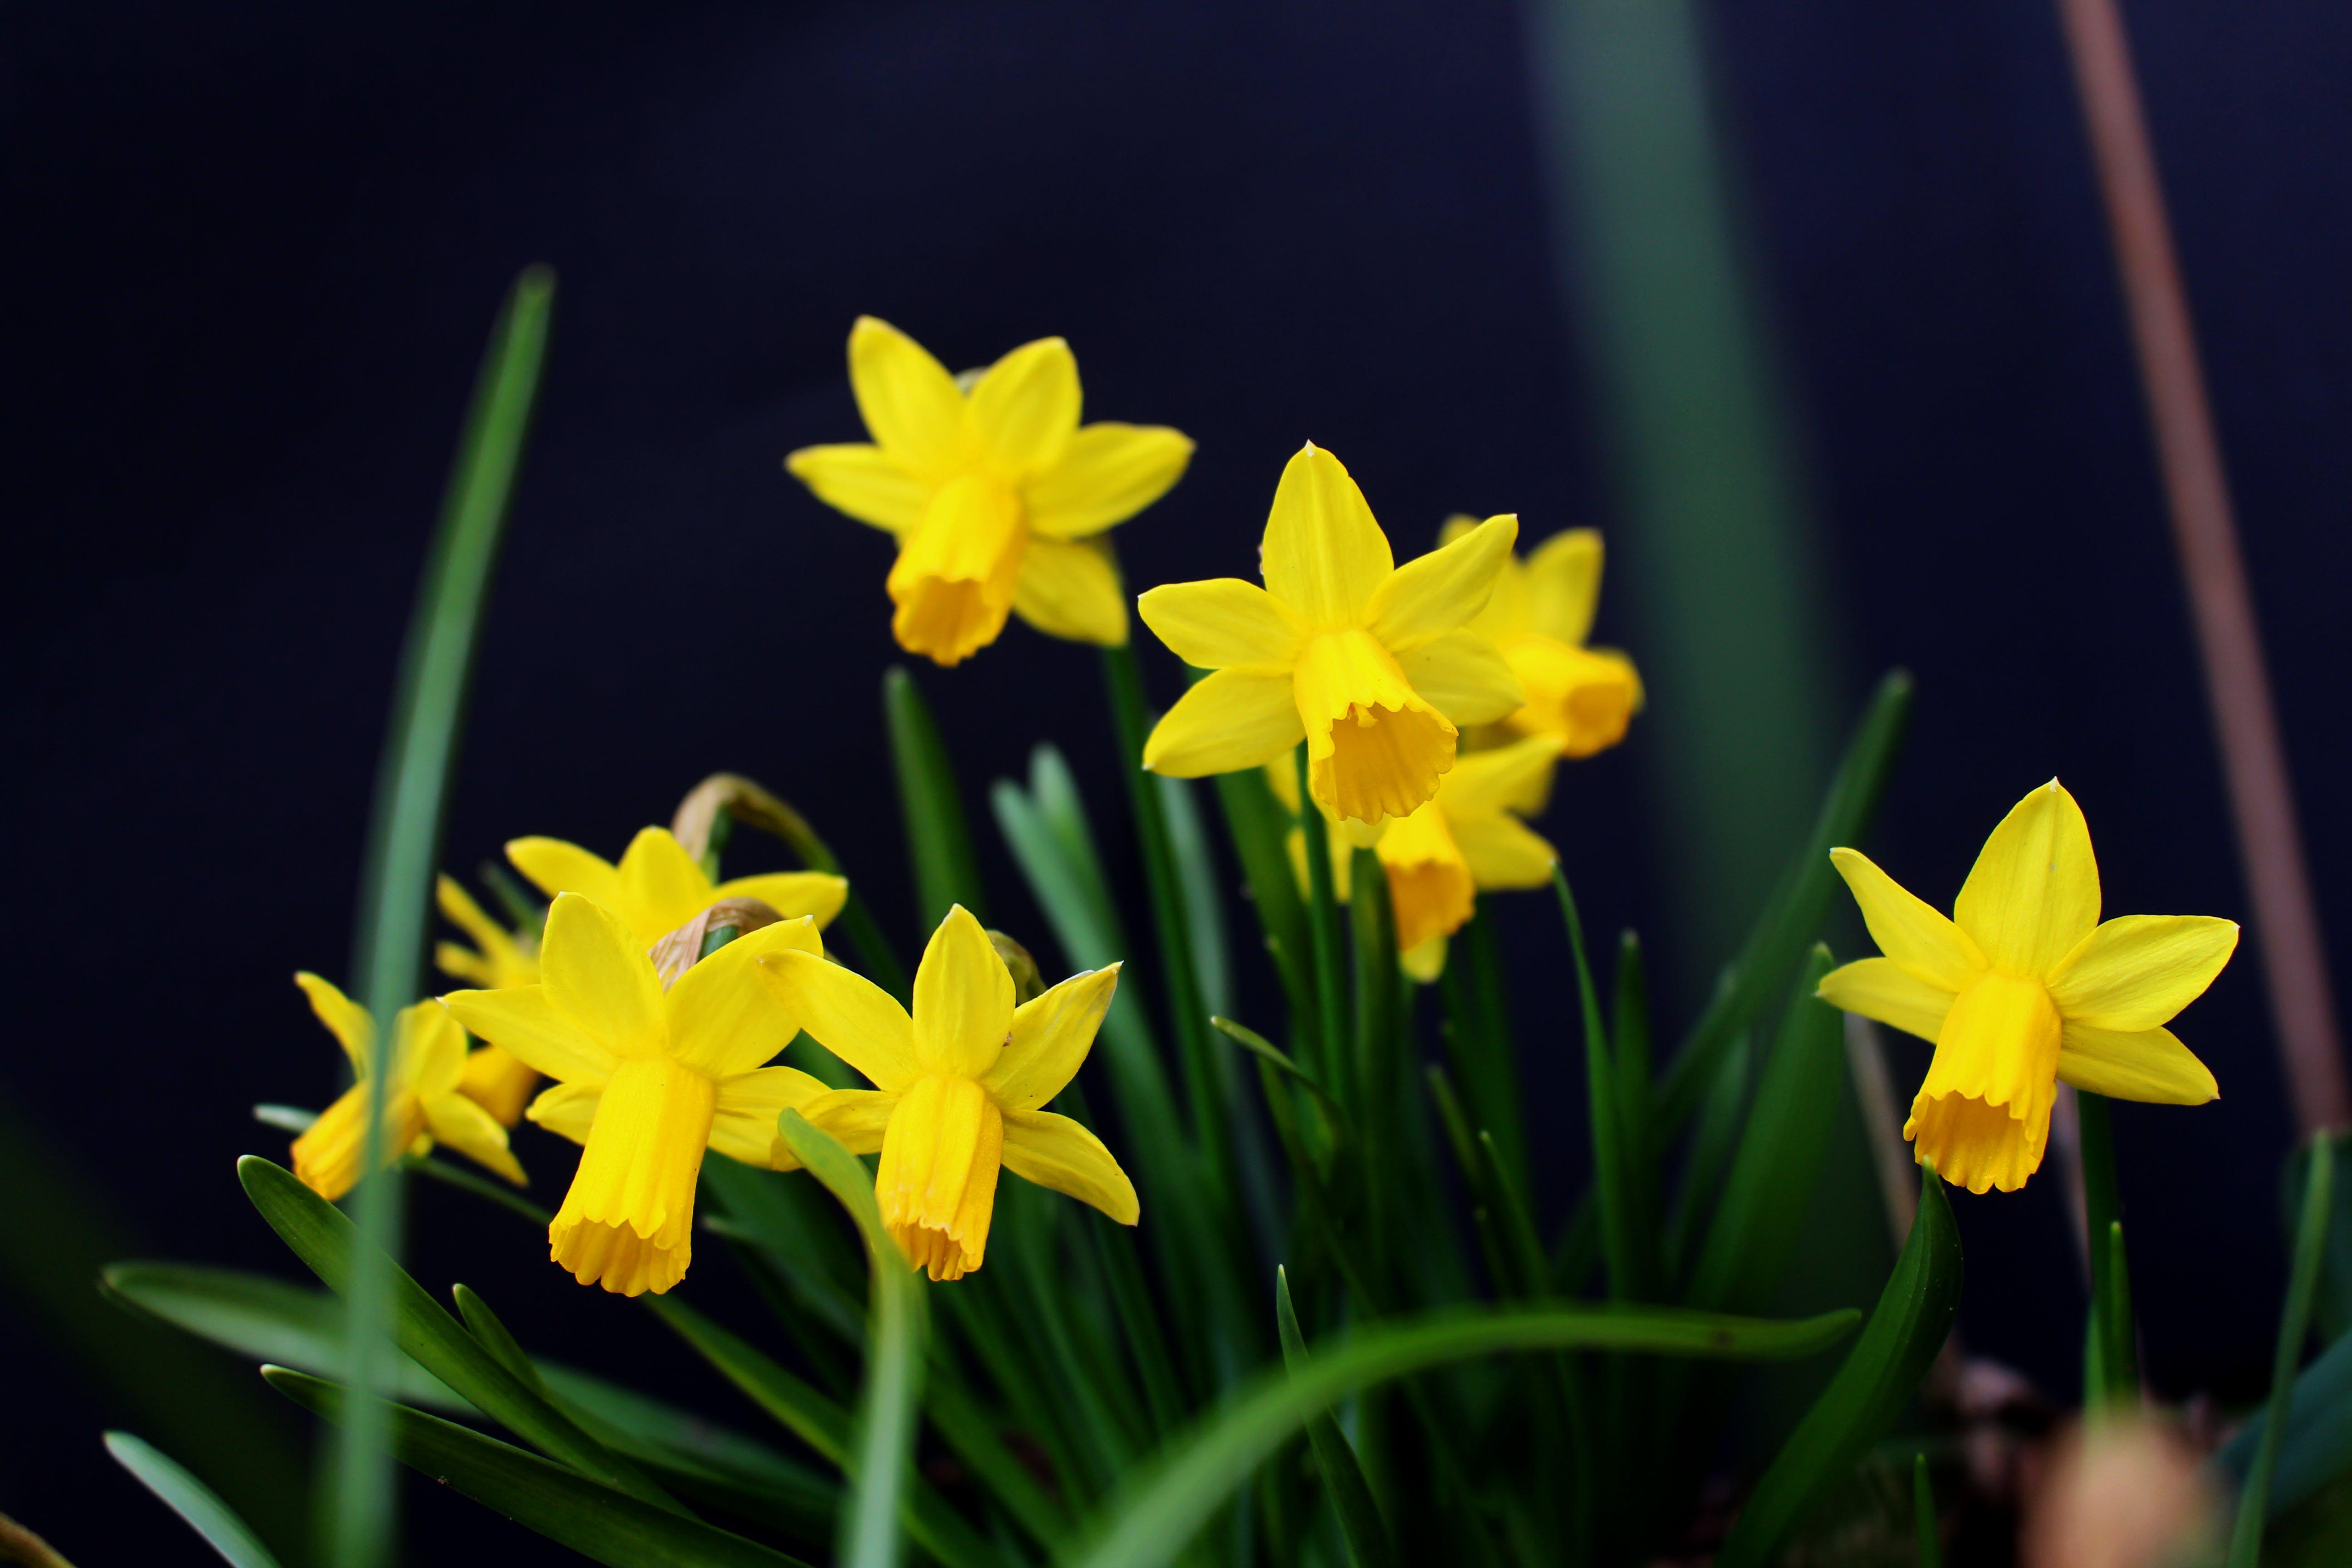 beautiful flower, black background, daffodil